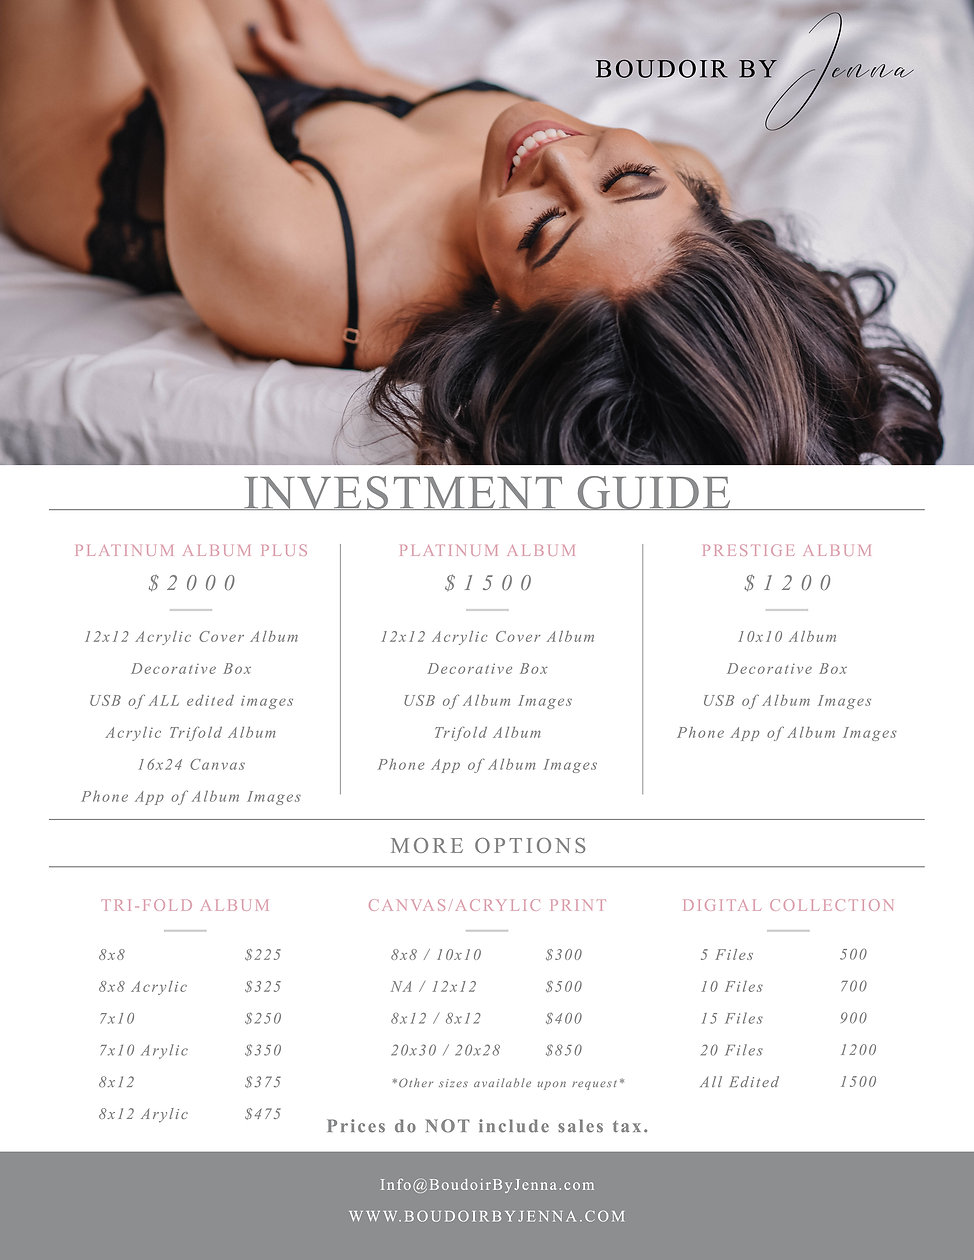 Investment Guide.jpg